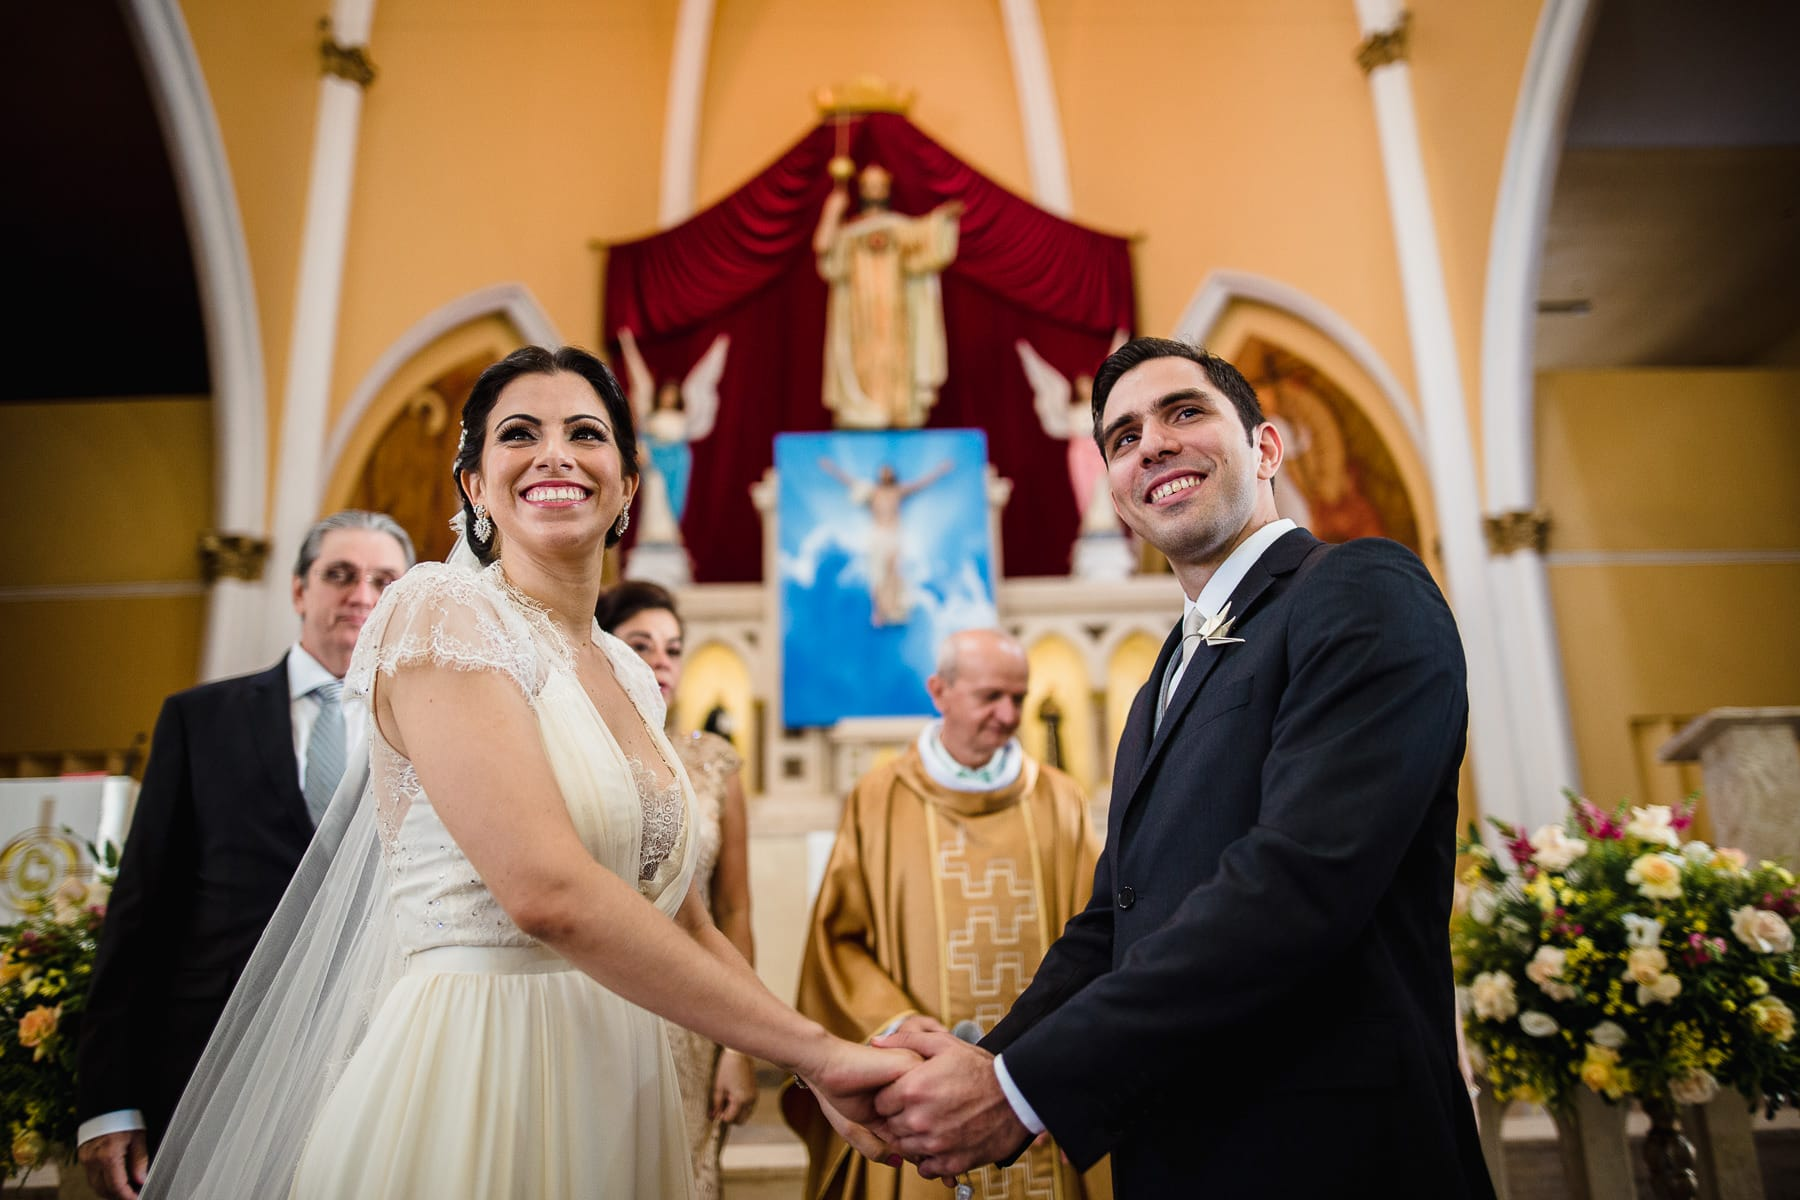 casamento-igreja-do-cristo-rei-fortaleza-43